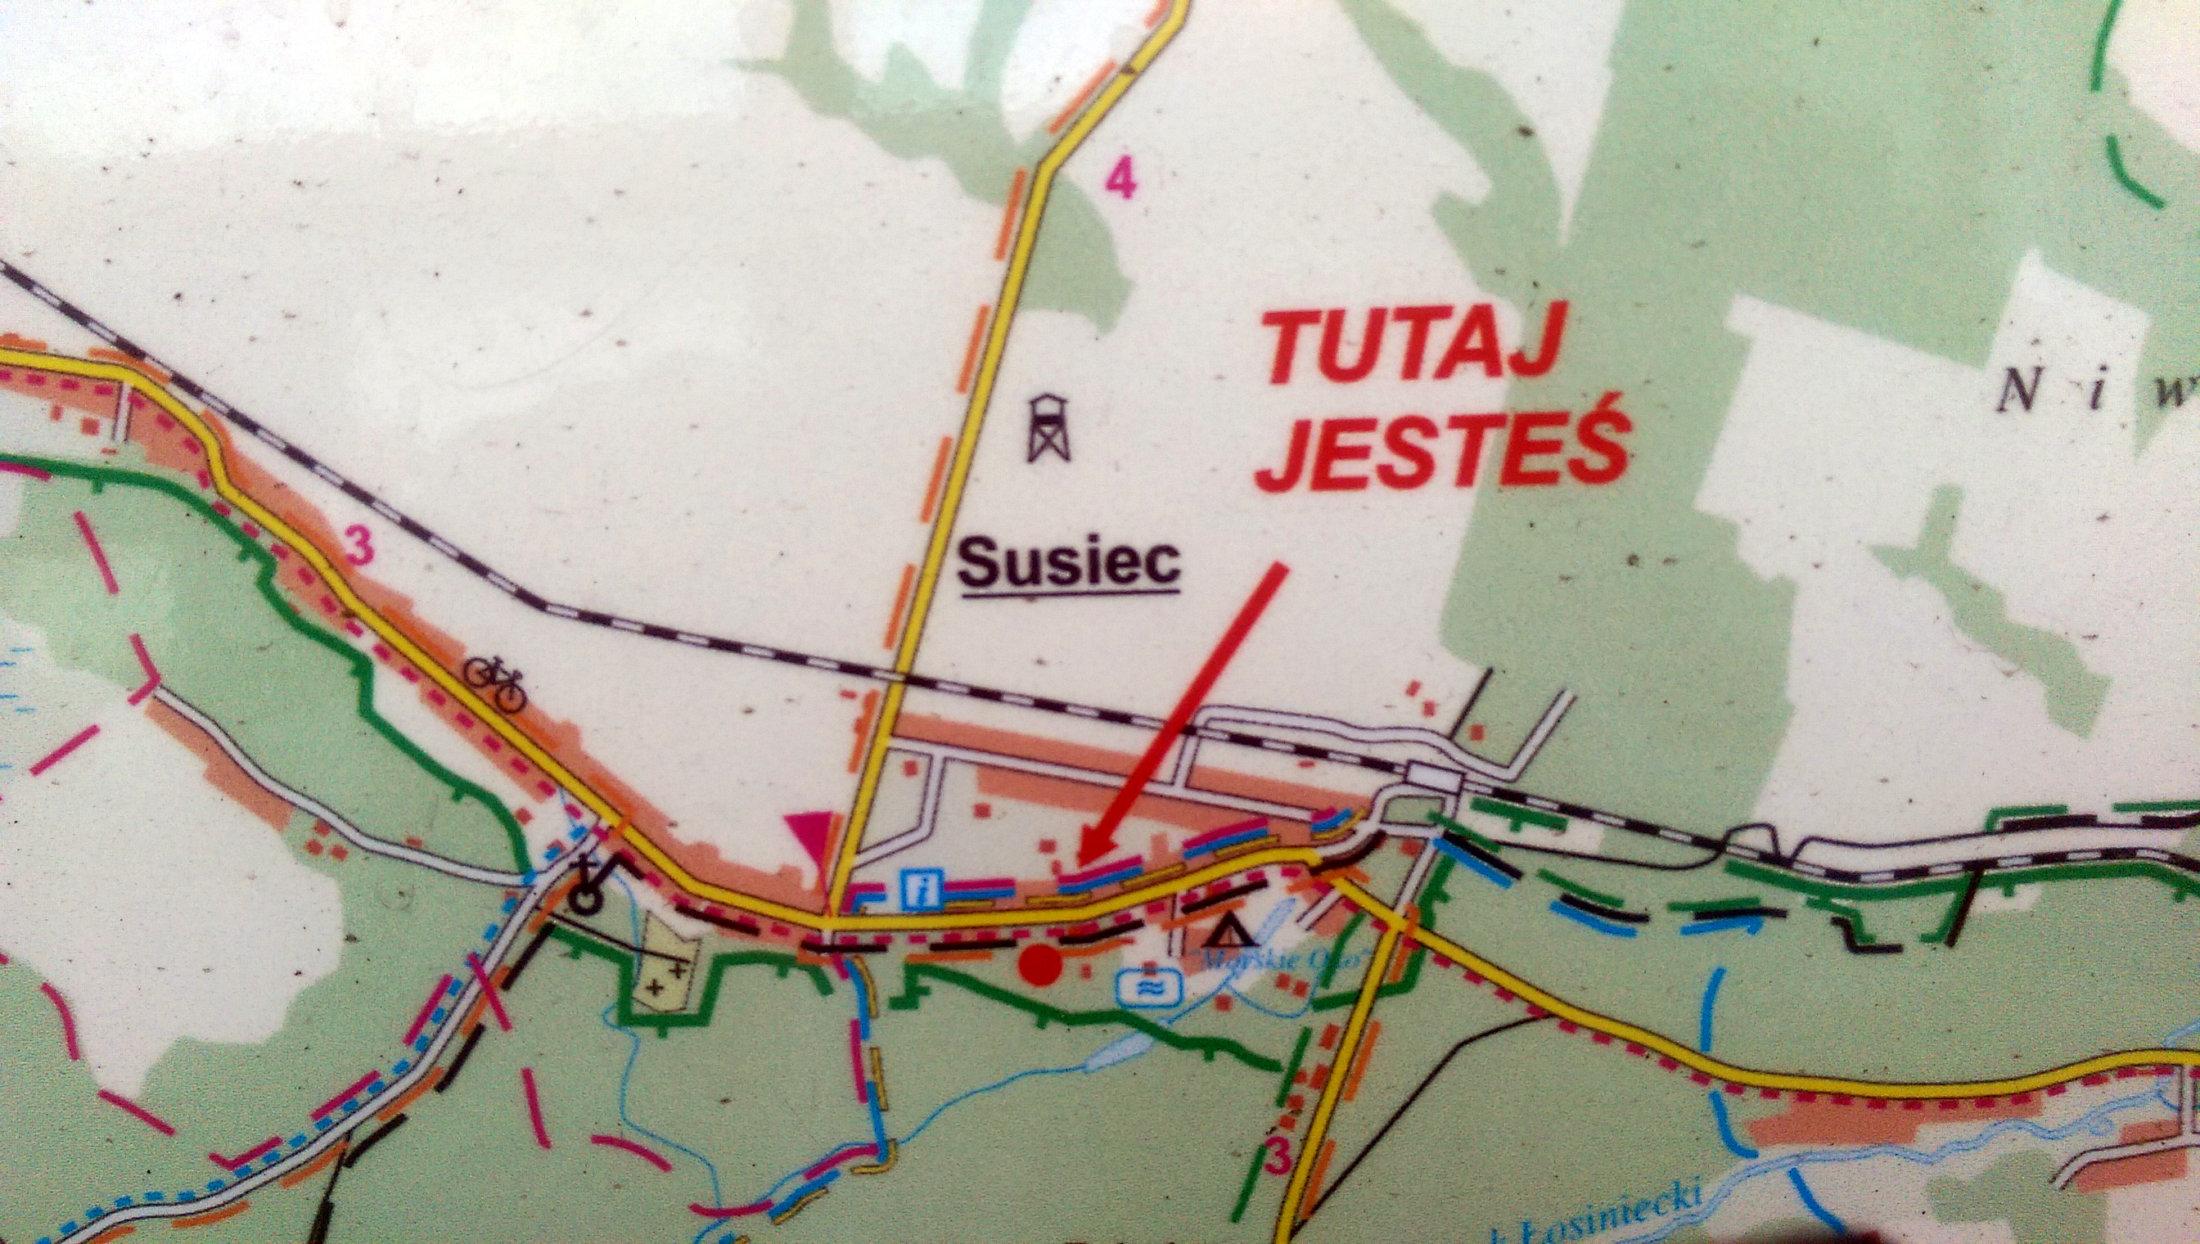 Susiec Mapa